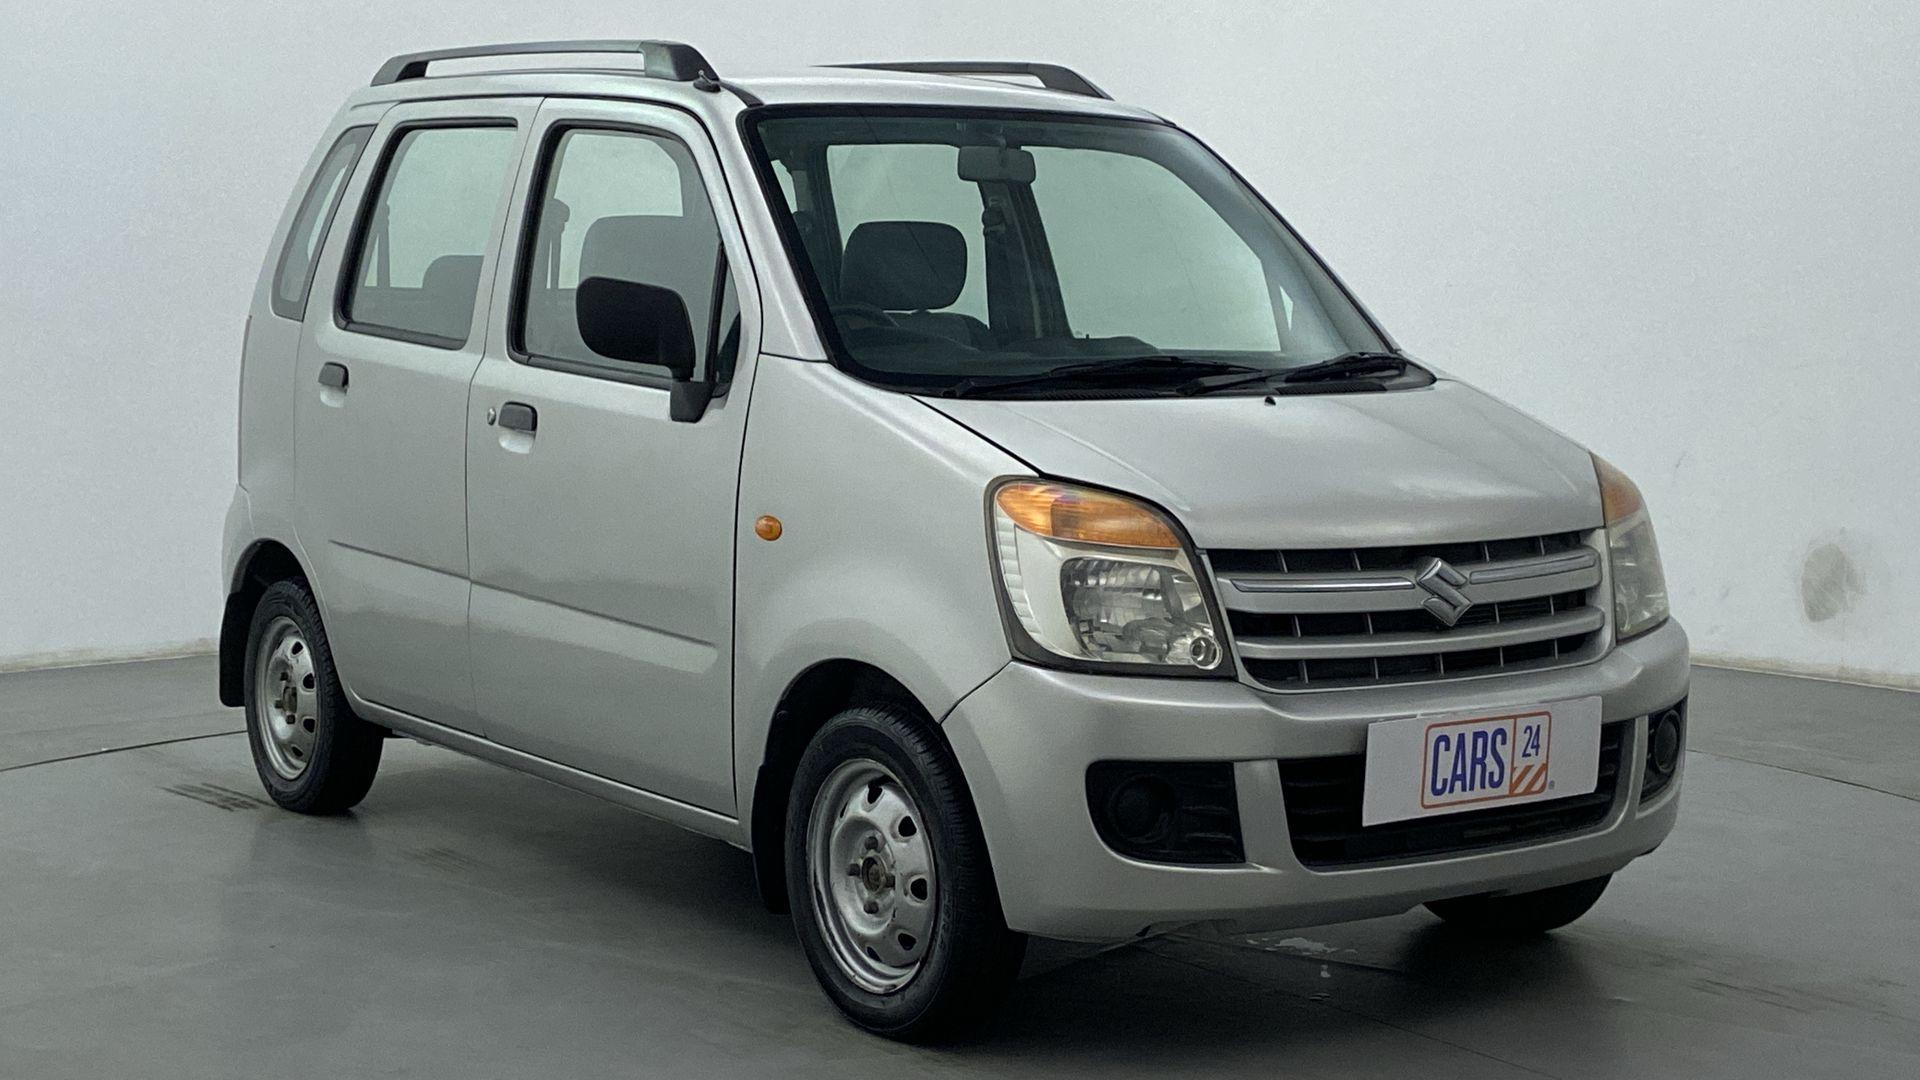 2009 Maruti Wagon R LXI